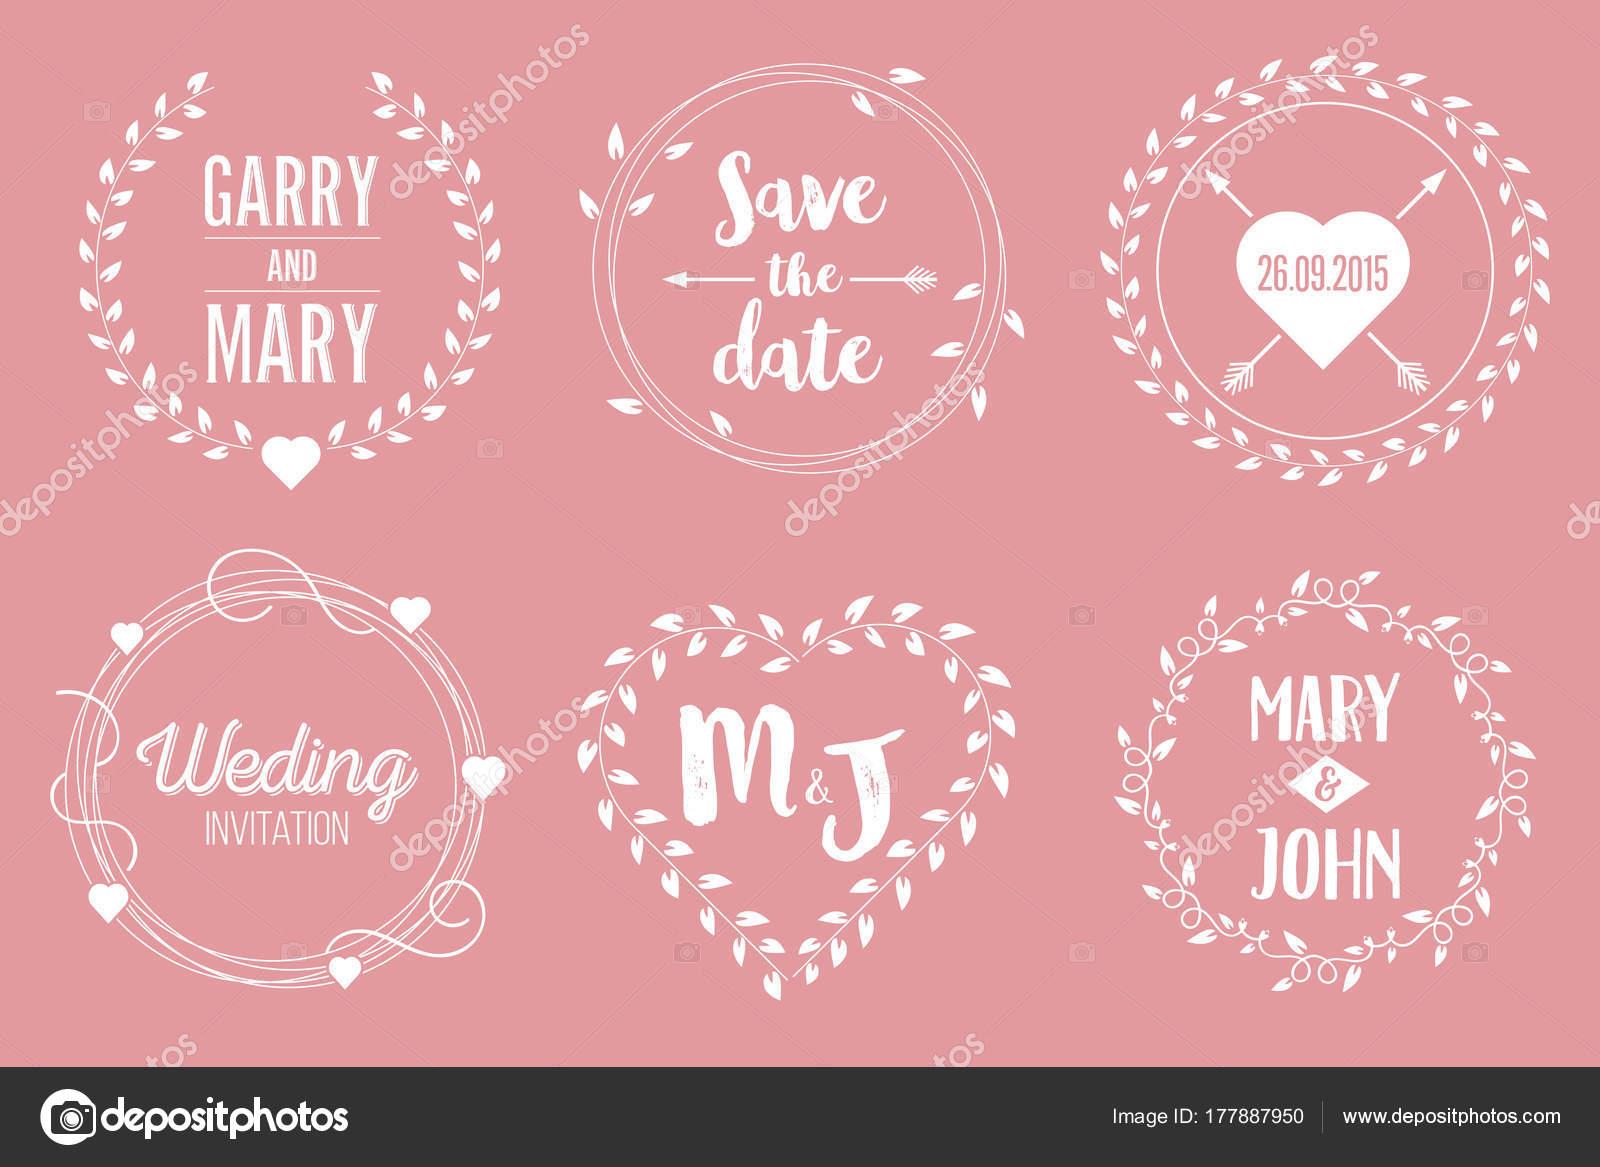 Creative Vector Illustration Date Wedding Witn Name Set